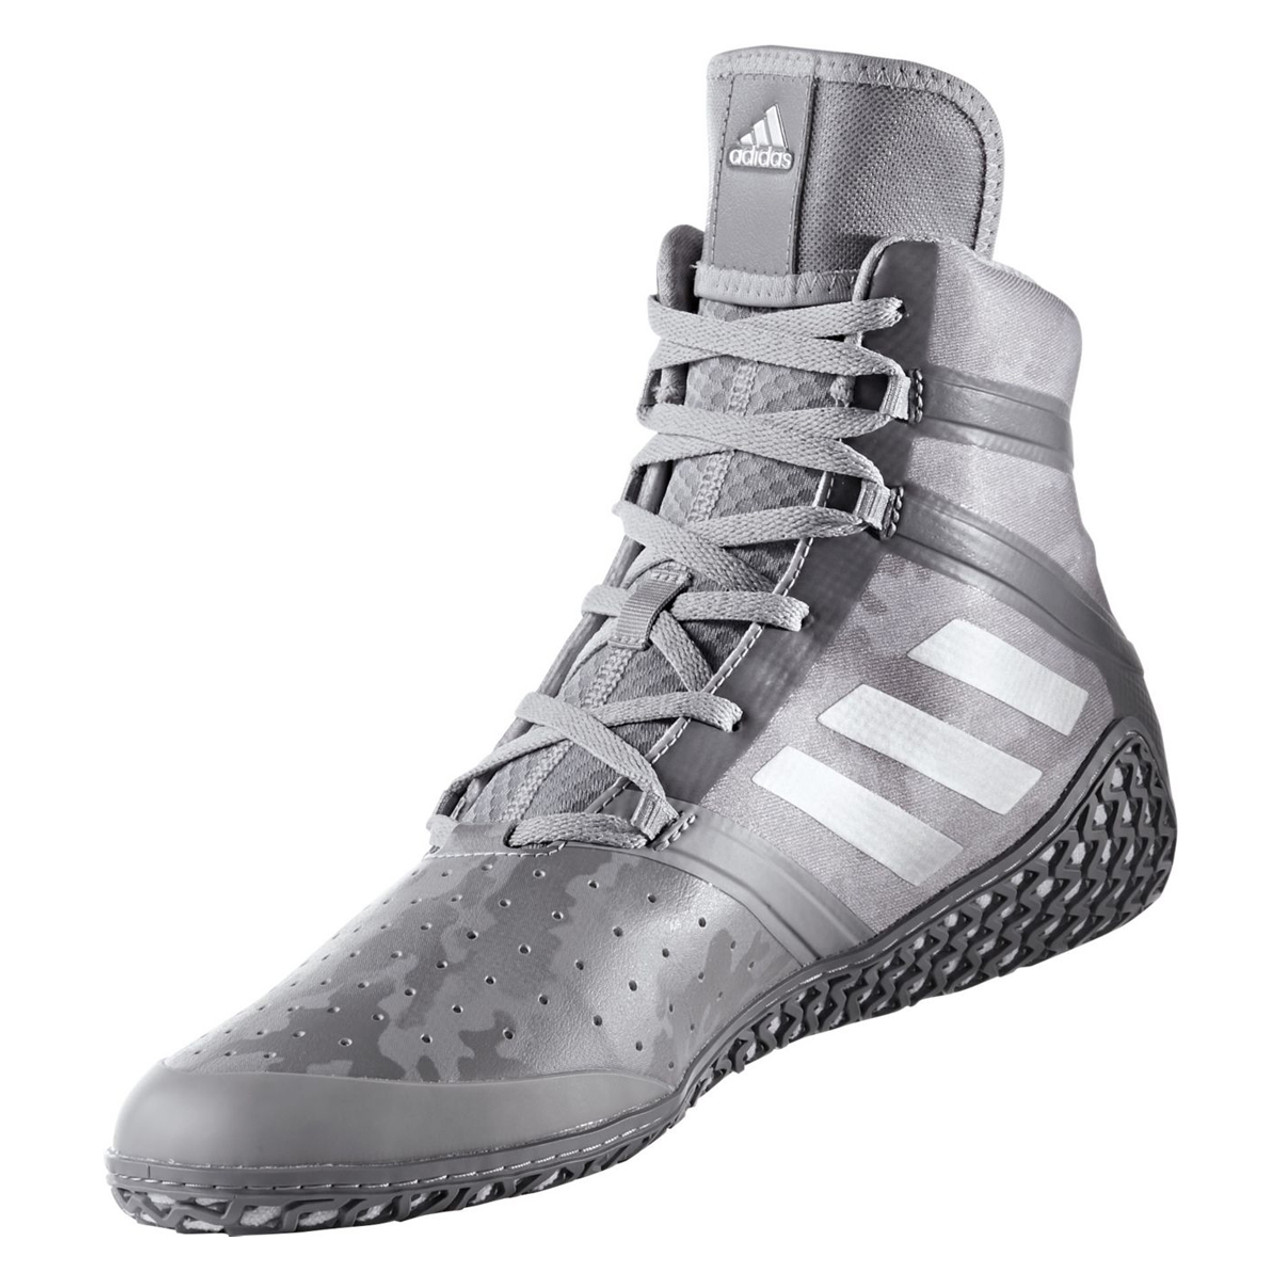 70dc9491e30fe Adidas Impact Men's Wrestling Shoes BY1579 - Gray Camo